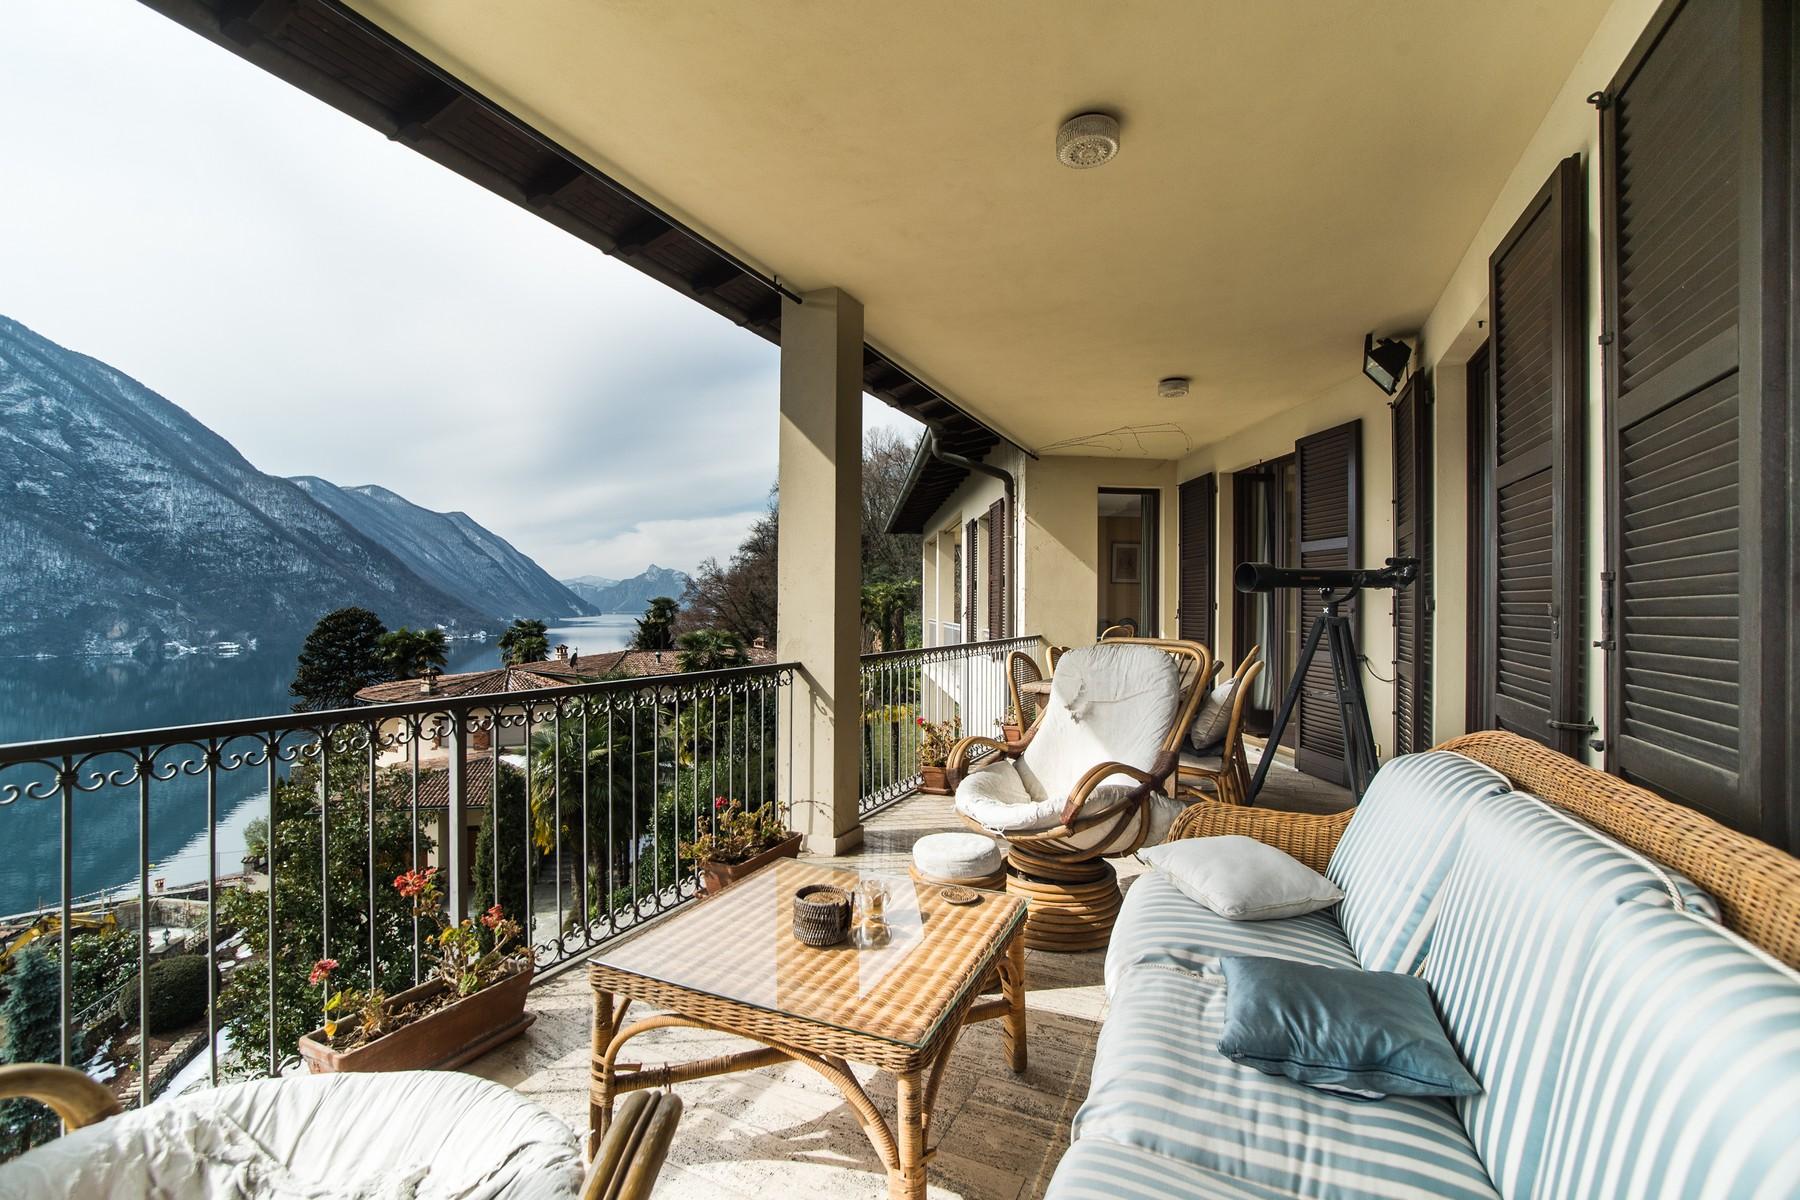 Additional photo for property listing at Prestigious villa on Lake Lugano Via G. Finali Valsolda, Como 22010 Italia